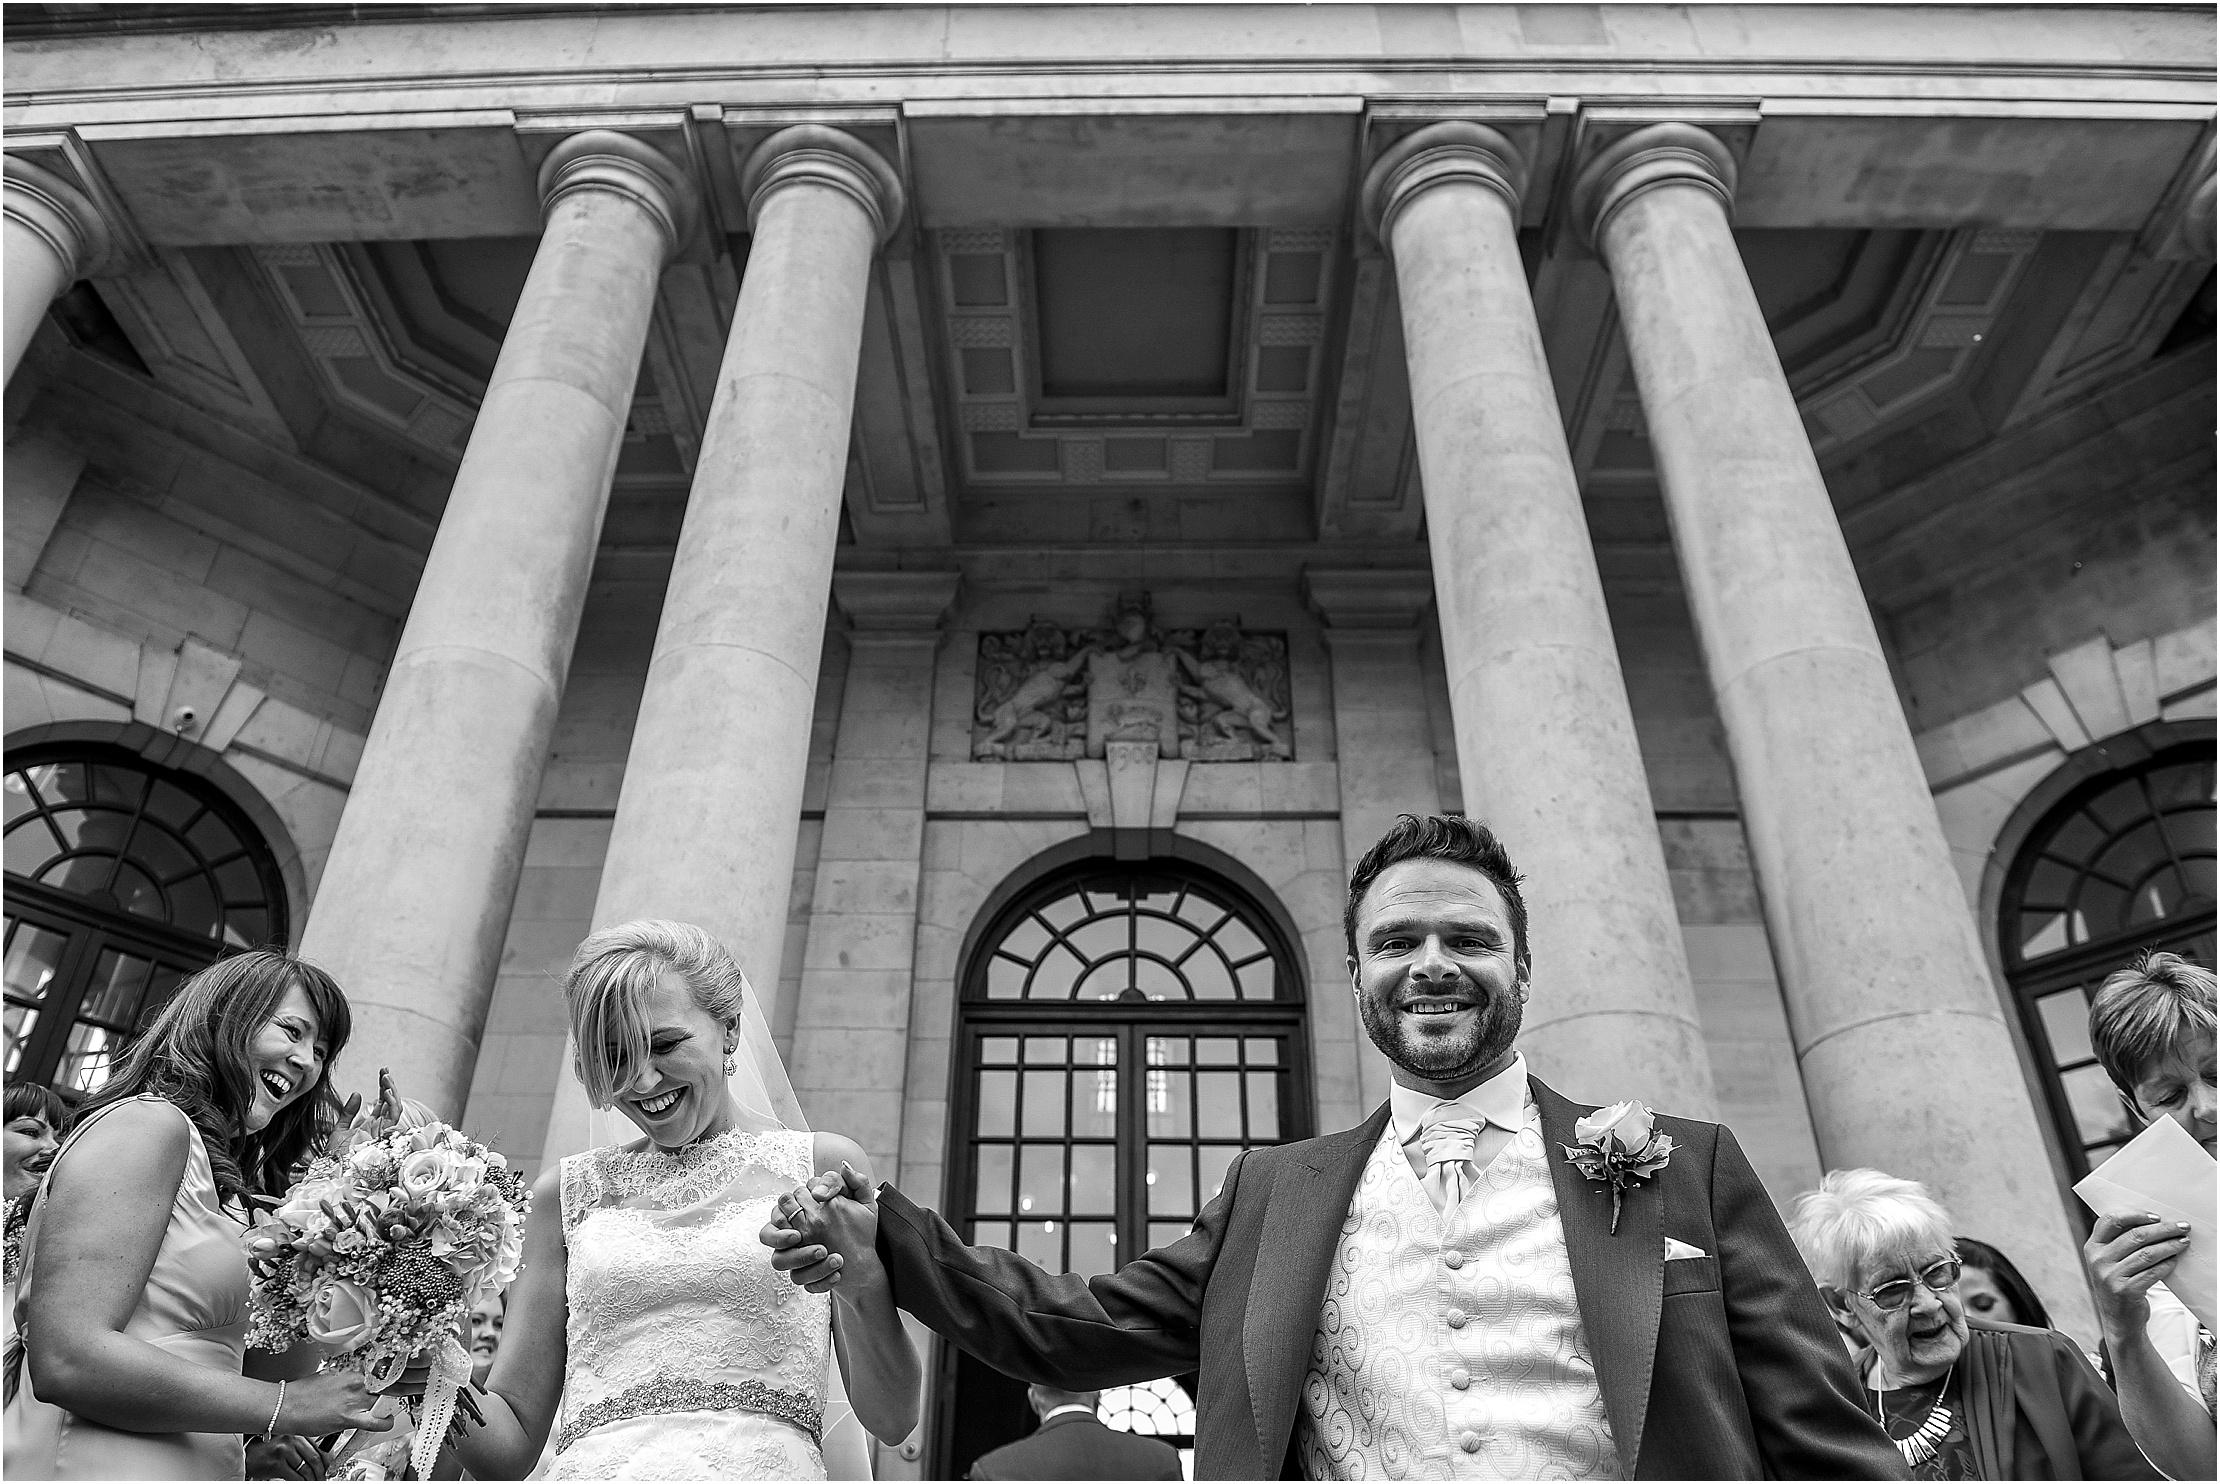 staining-lodge-wedding-077.jpg